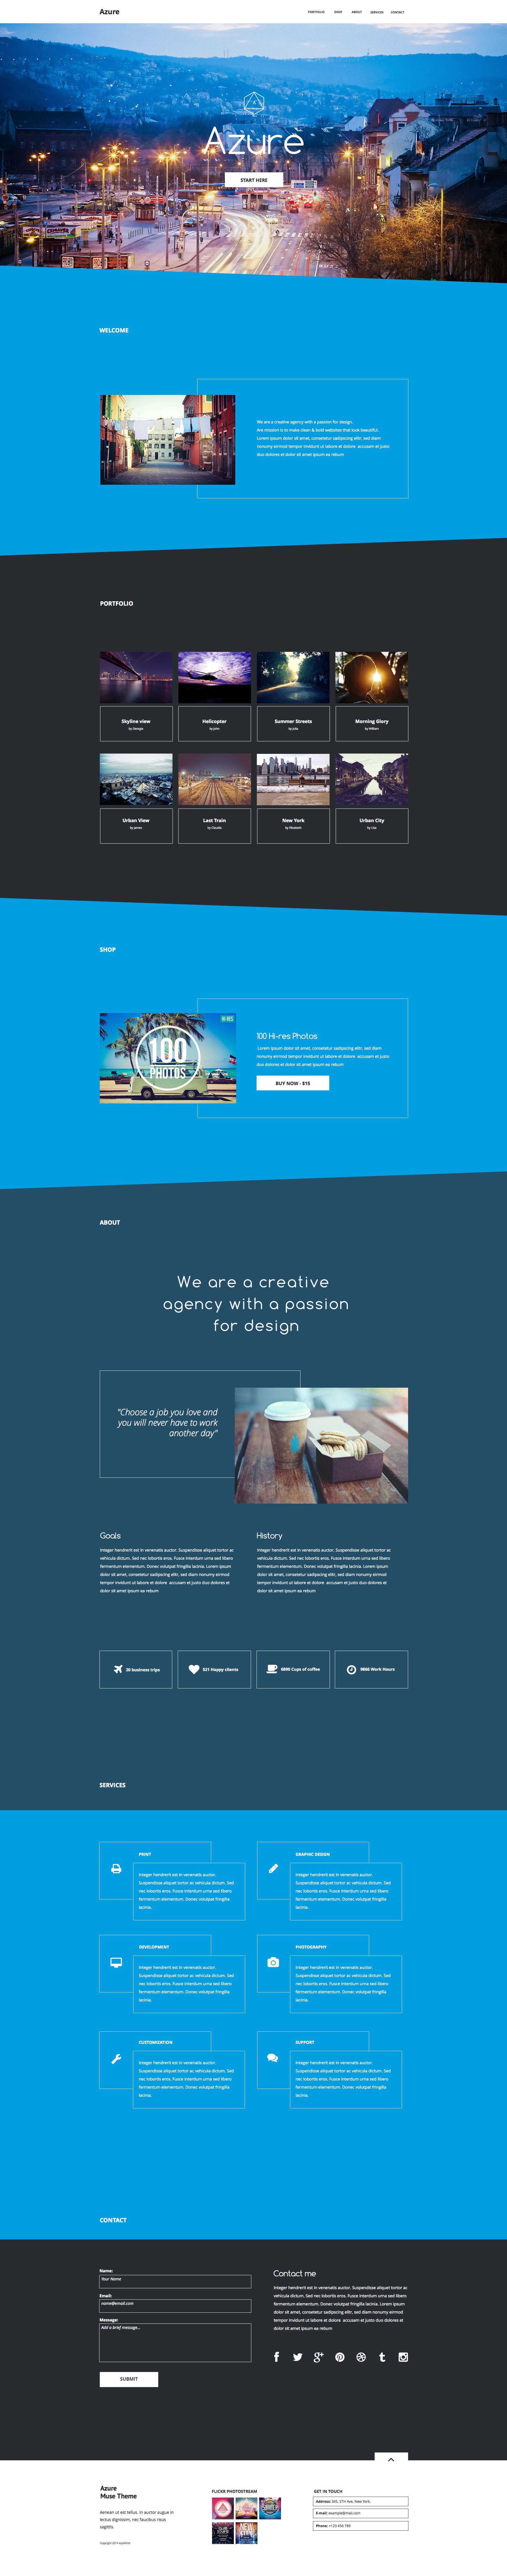 Azure - Pure Blue Muse Template for Portfolios & Creatives ...